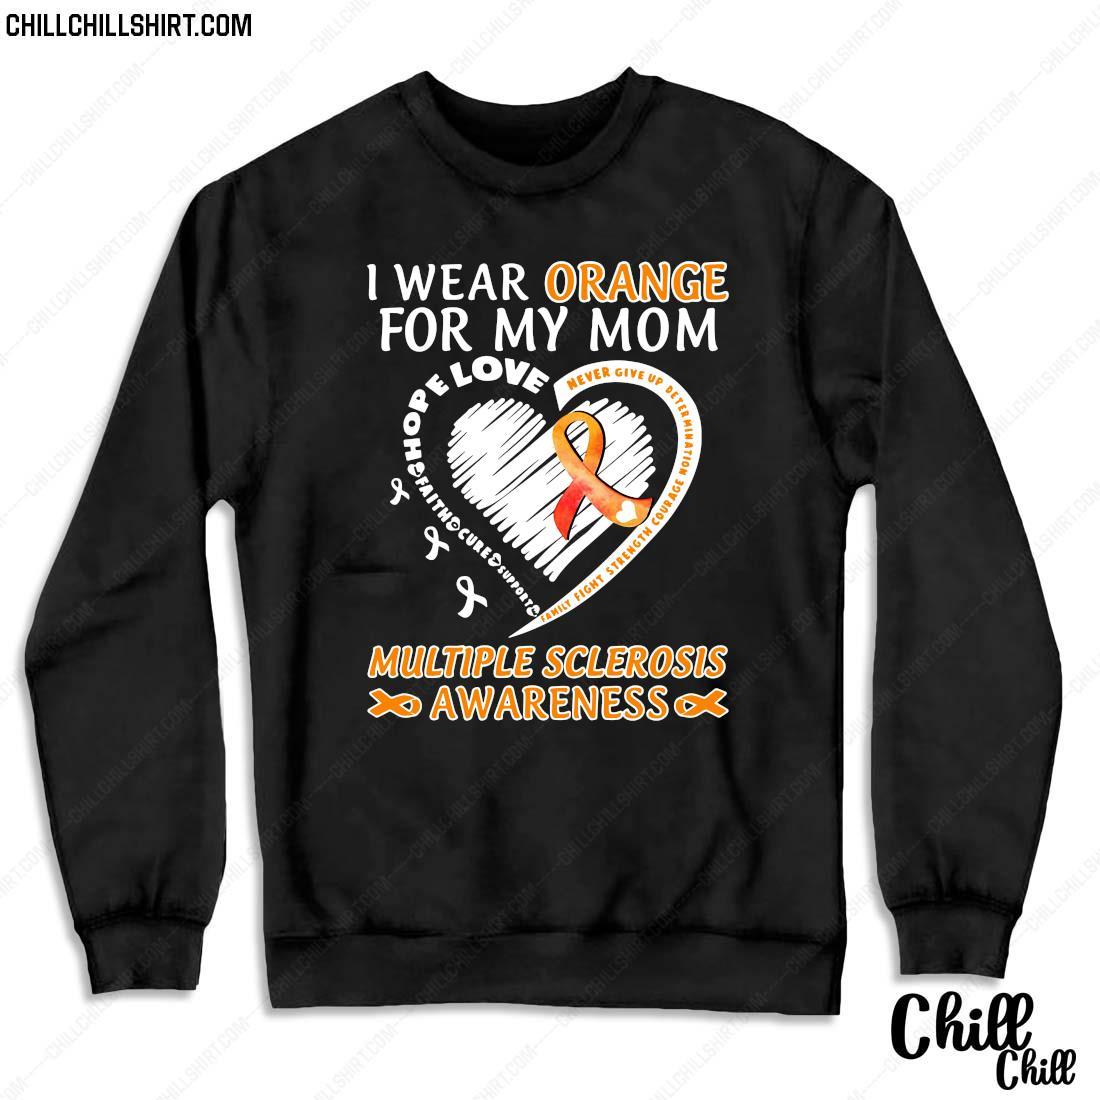 I Wear Orange For My Mom Multiple Sclerosis Awareness Shirt Sweater